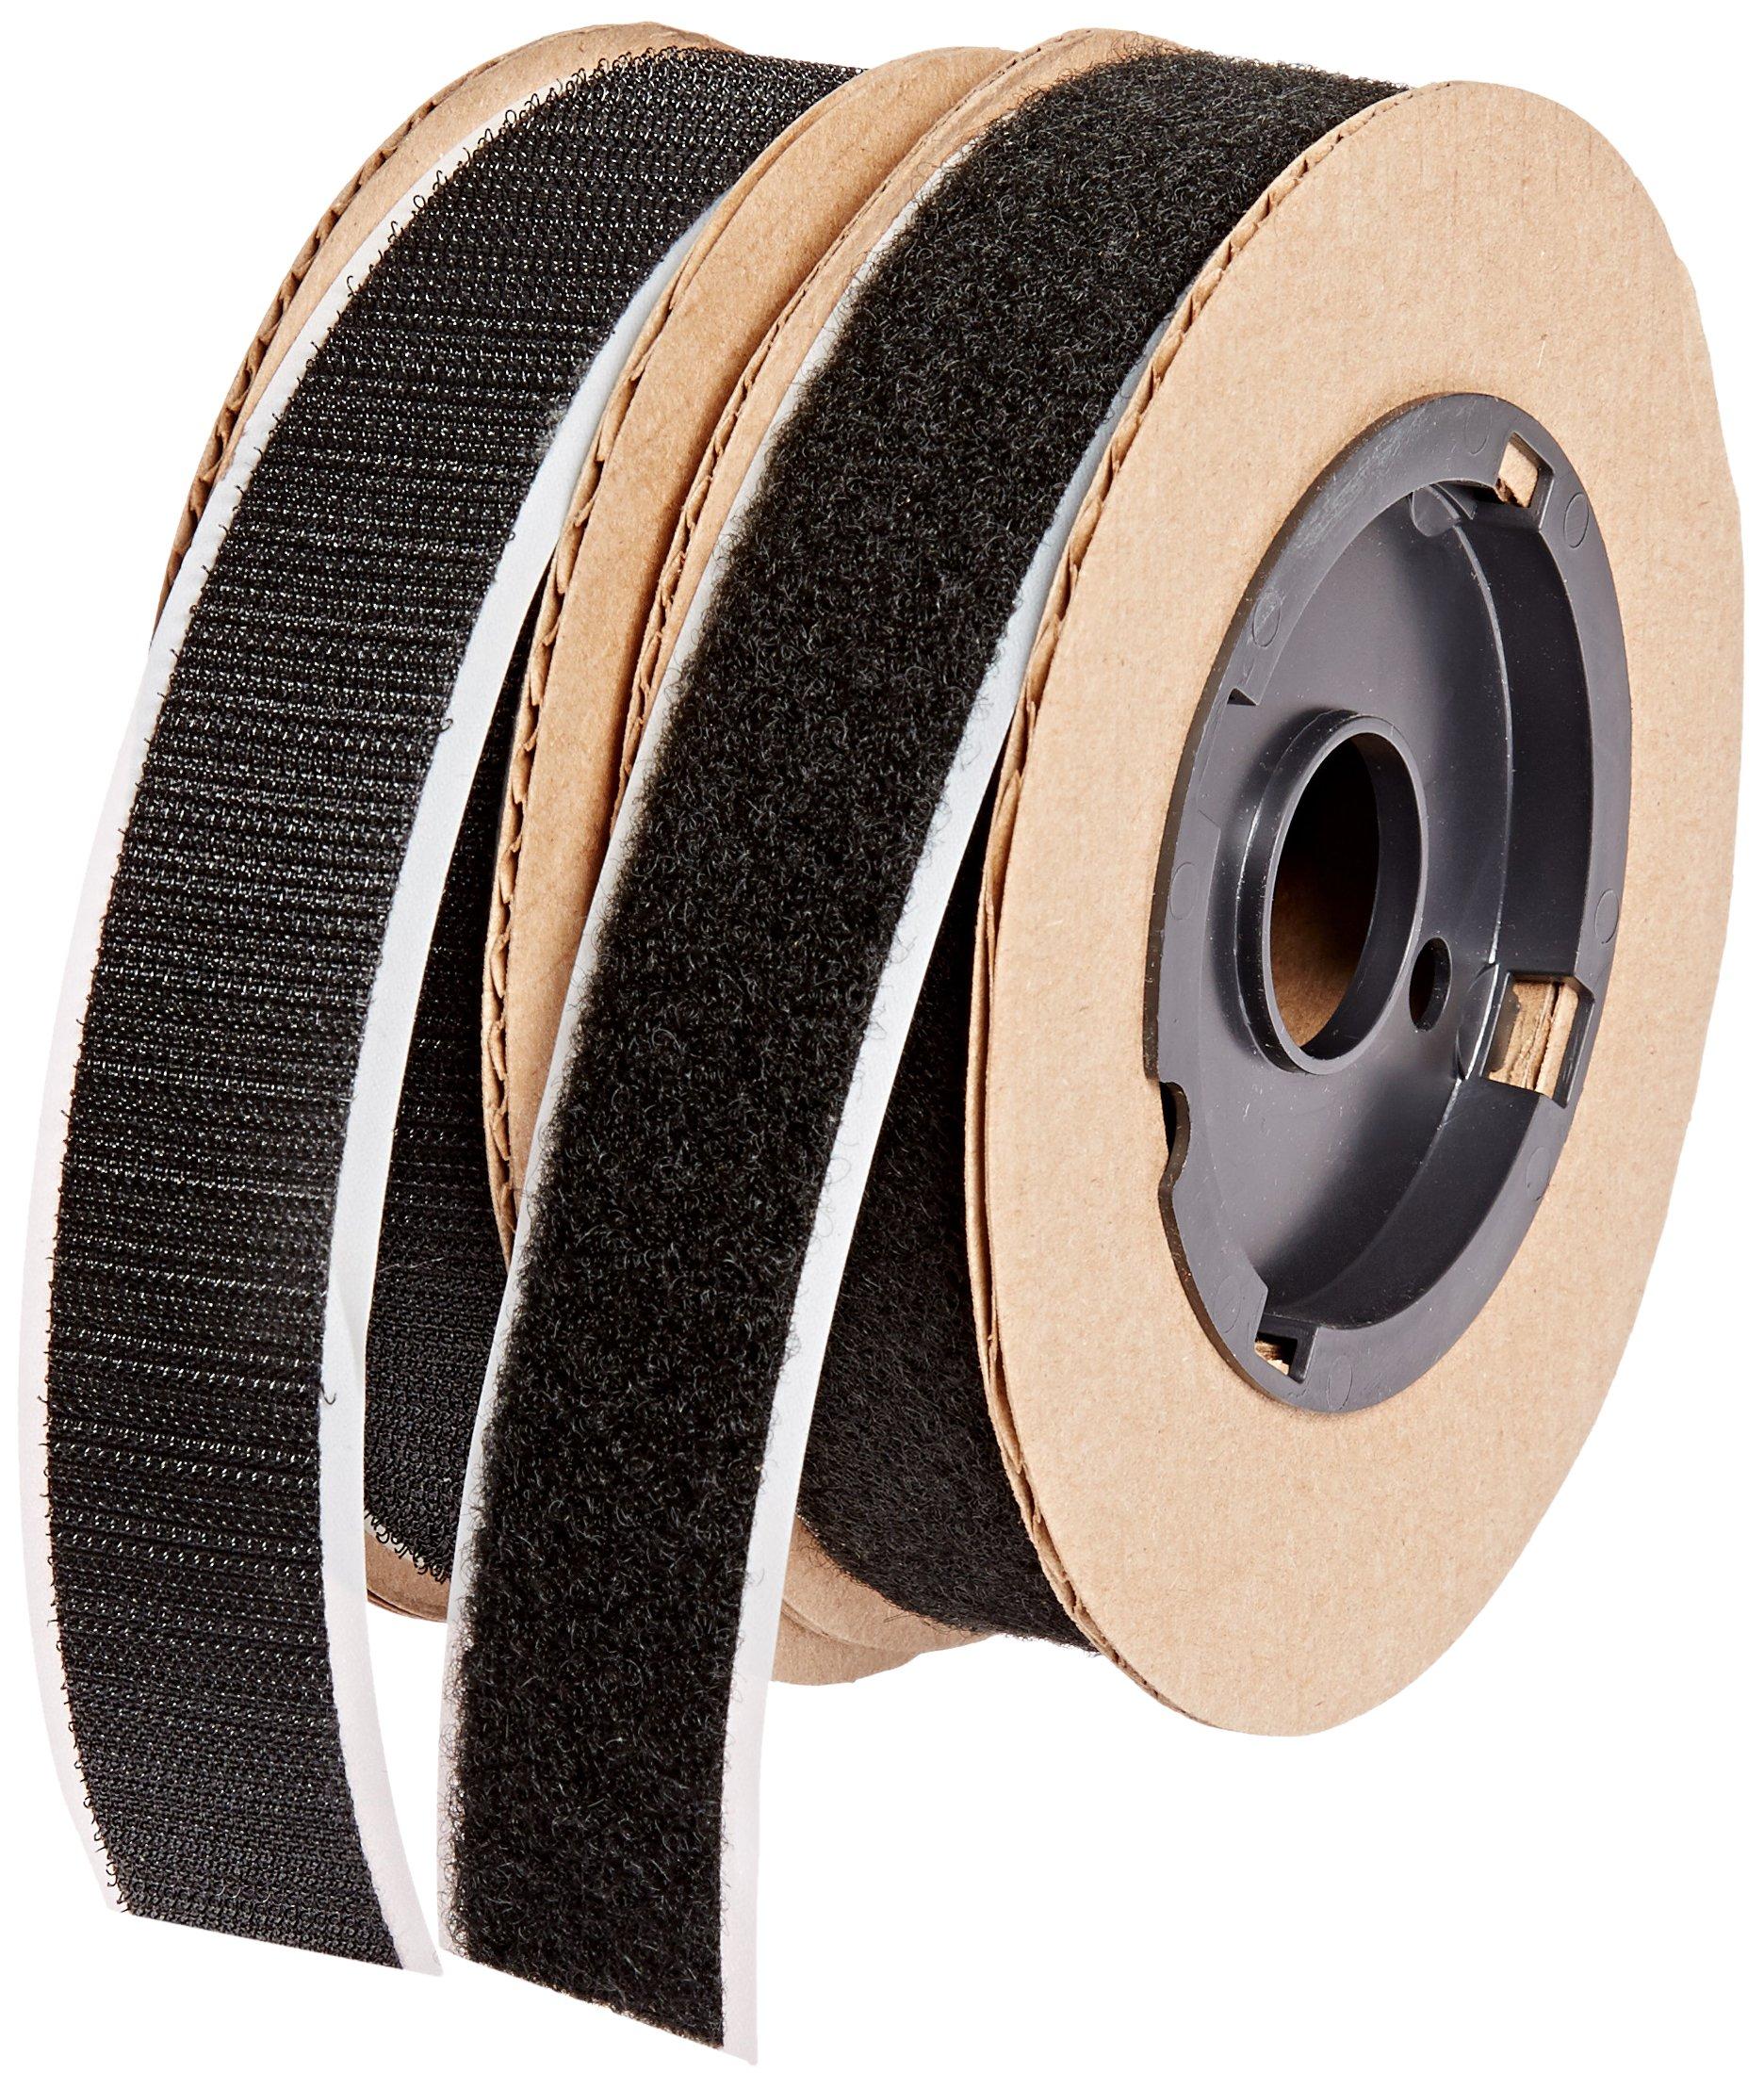 VELCRO 3804-SAT-PSA/B Black Super Adhesive Nylon Hook and Loop Combo Pack, 0132 Adhesive Backed, 1'' Wide, 15' Length